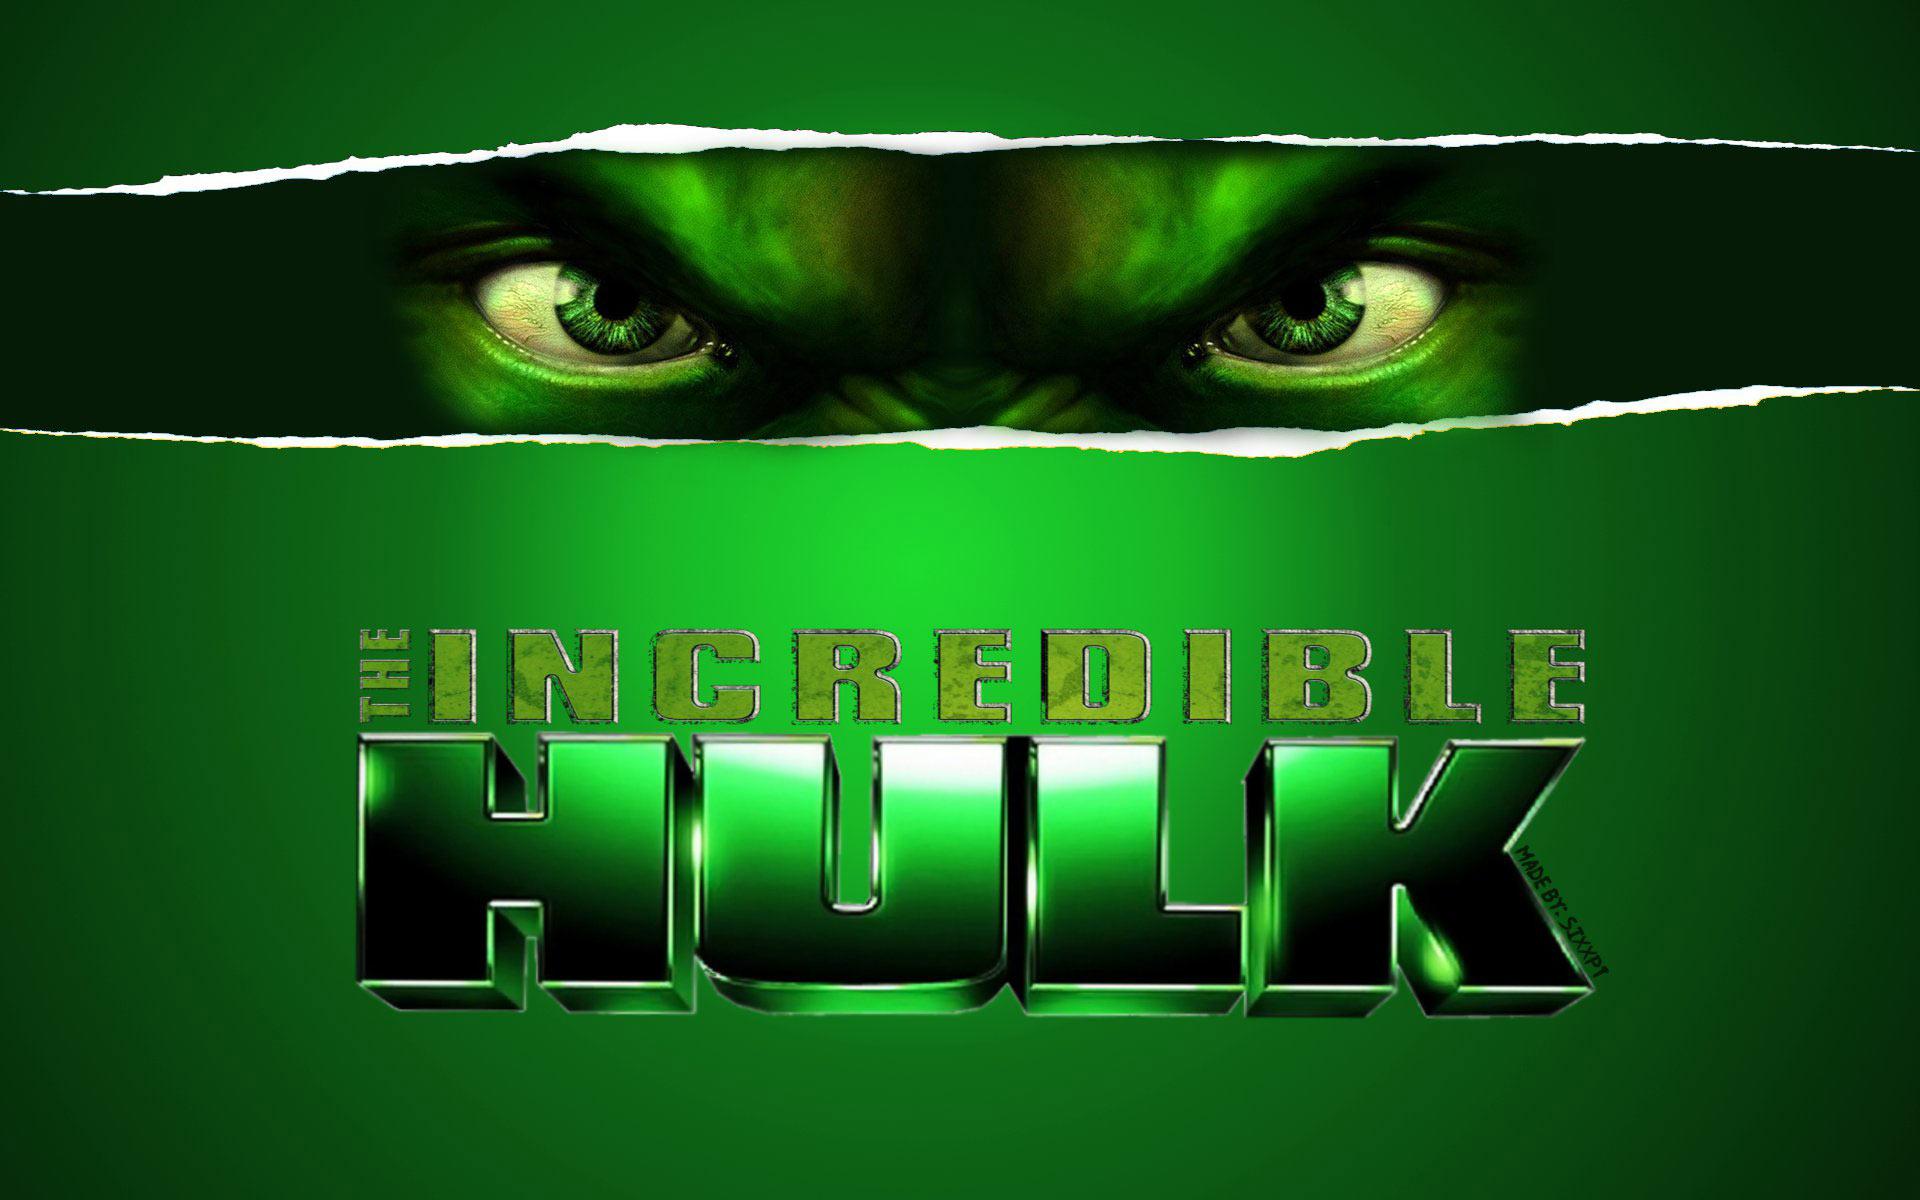 The Incredible Hulk HD Wallpaper Background Image 1920x1200 1920x1200